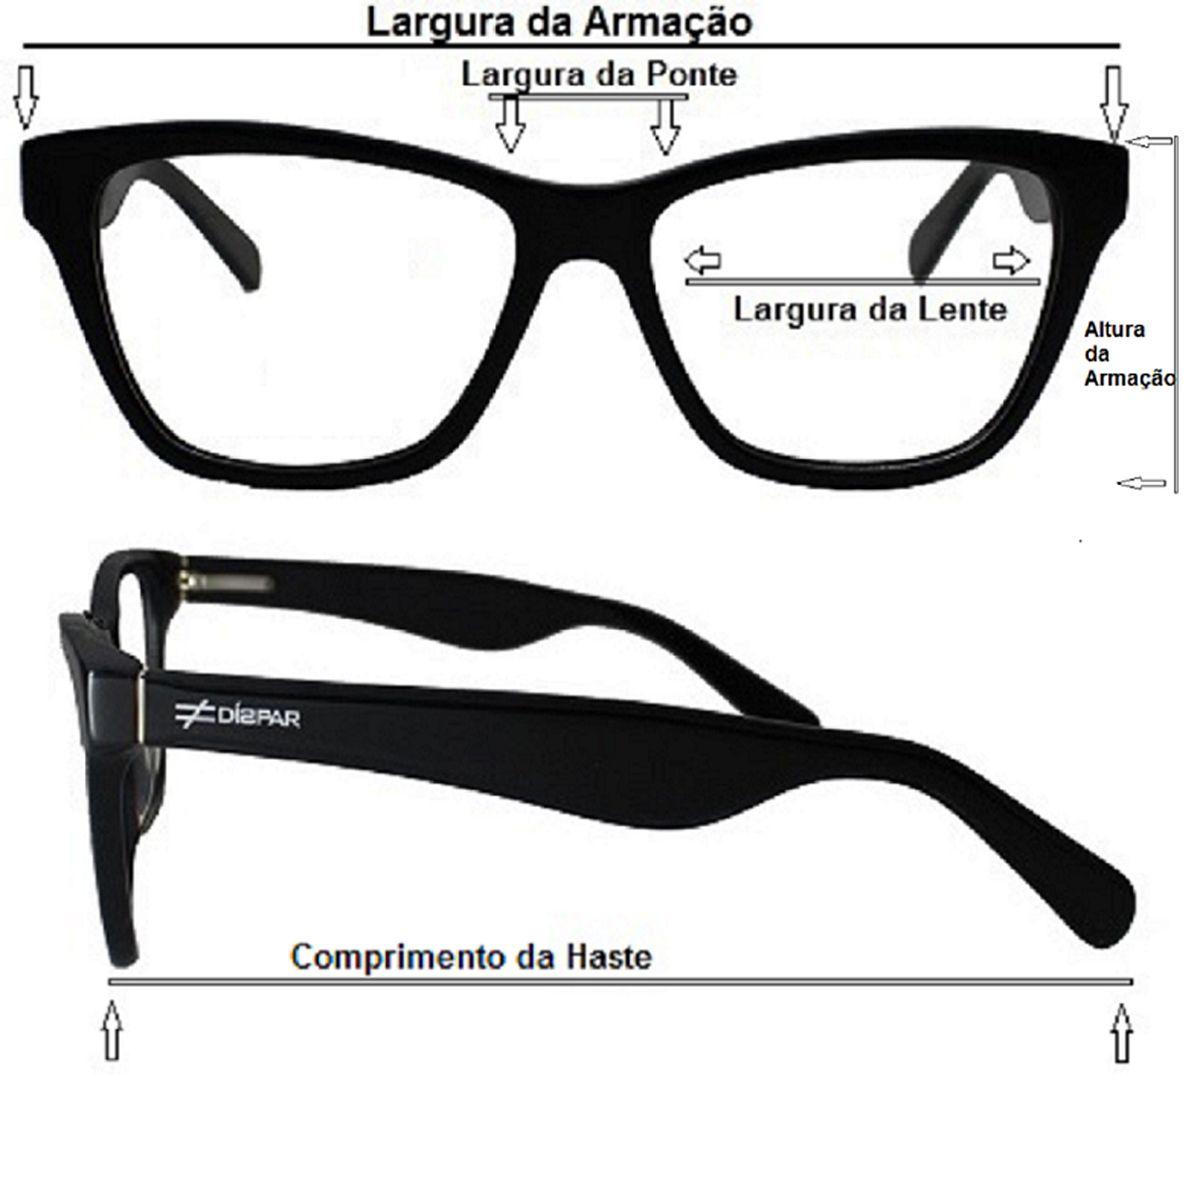 Óculos de Sol Díspar ID1895 infantil idade 9 a 12 anos Azul